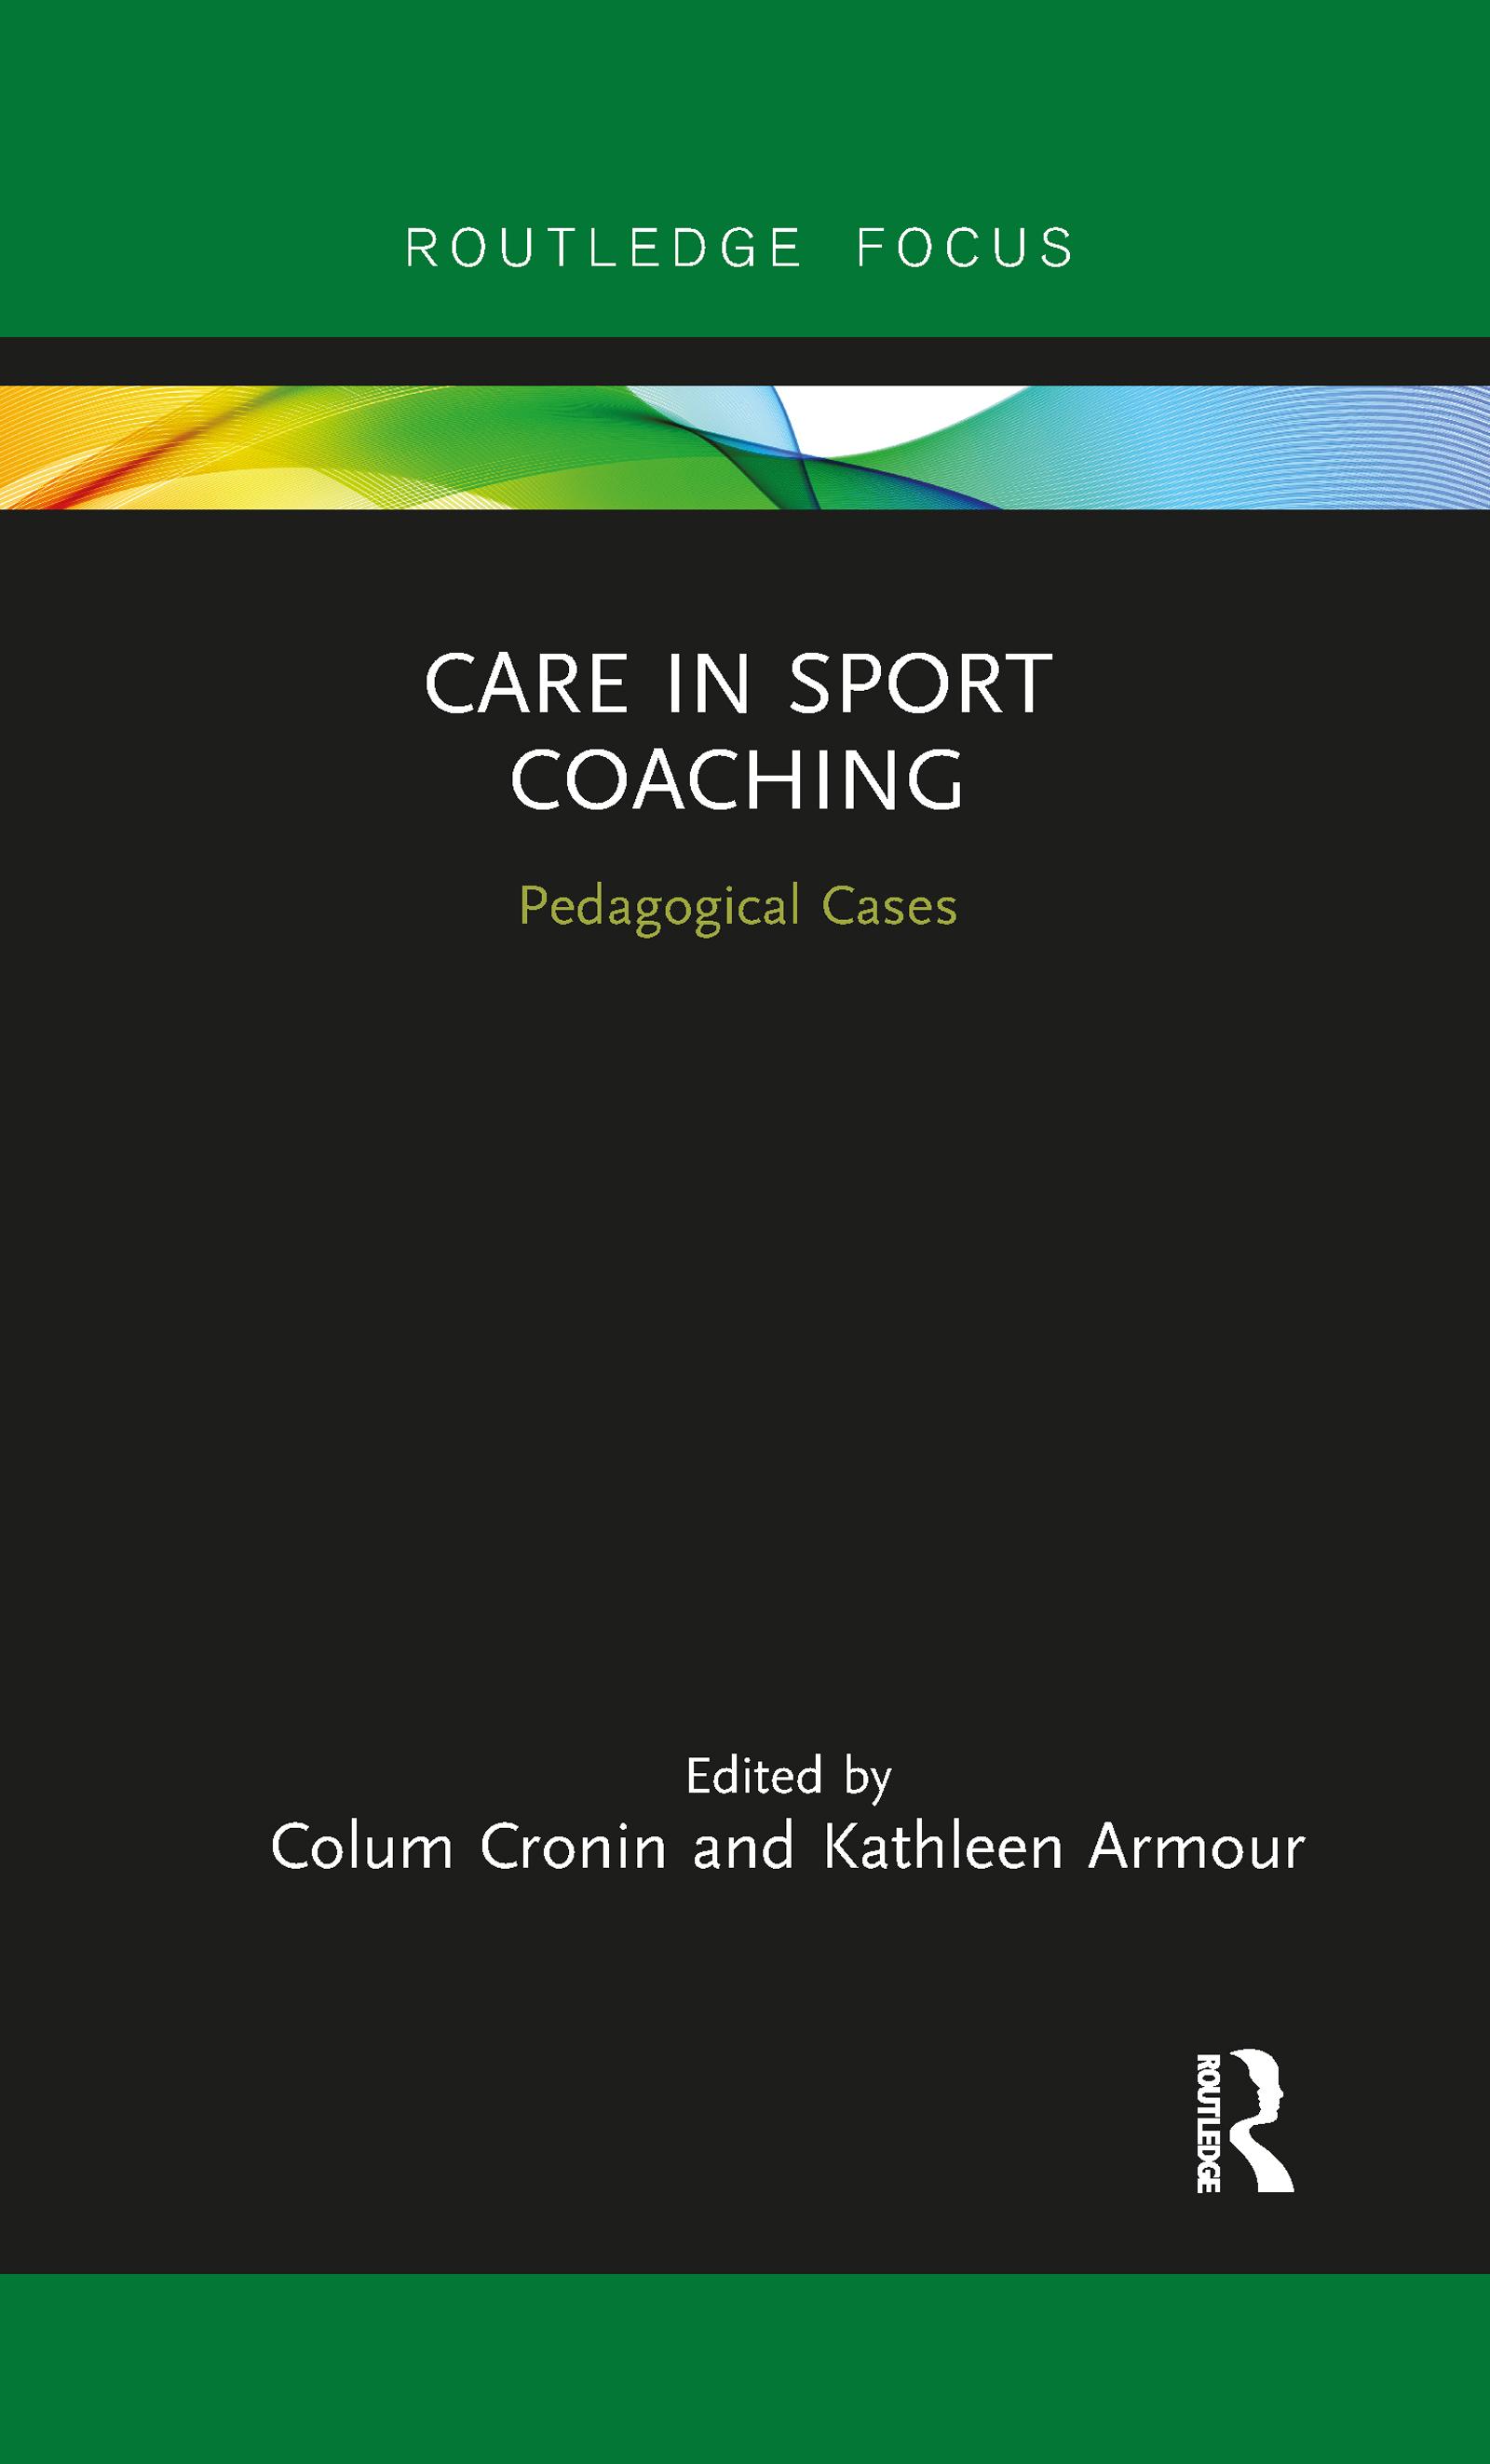 Care in Sport Coaching